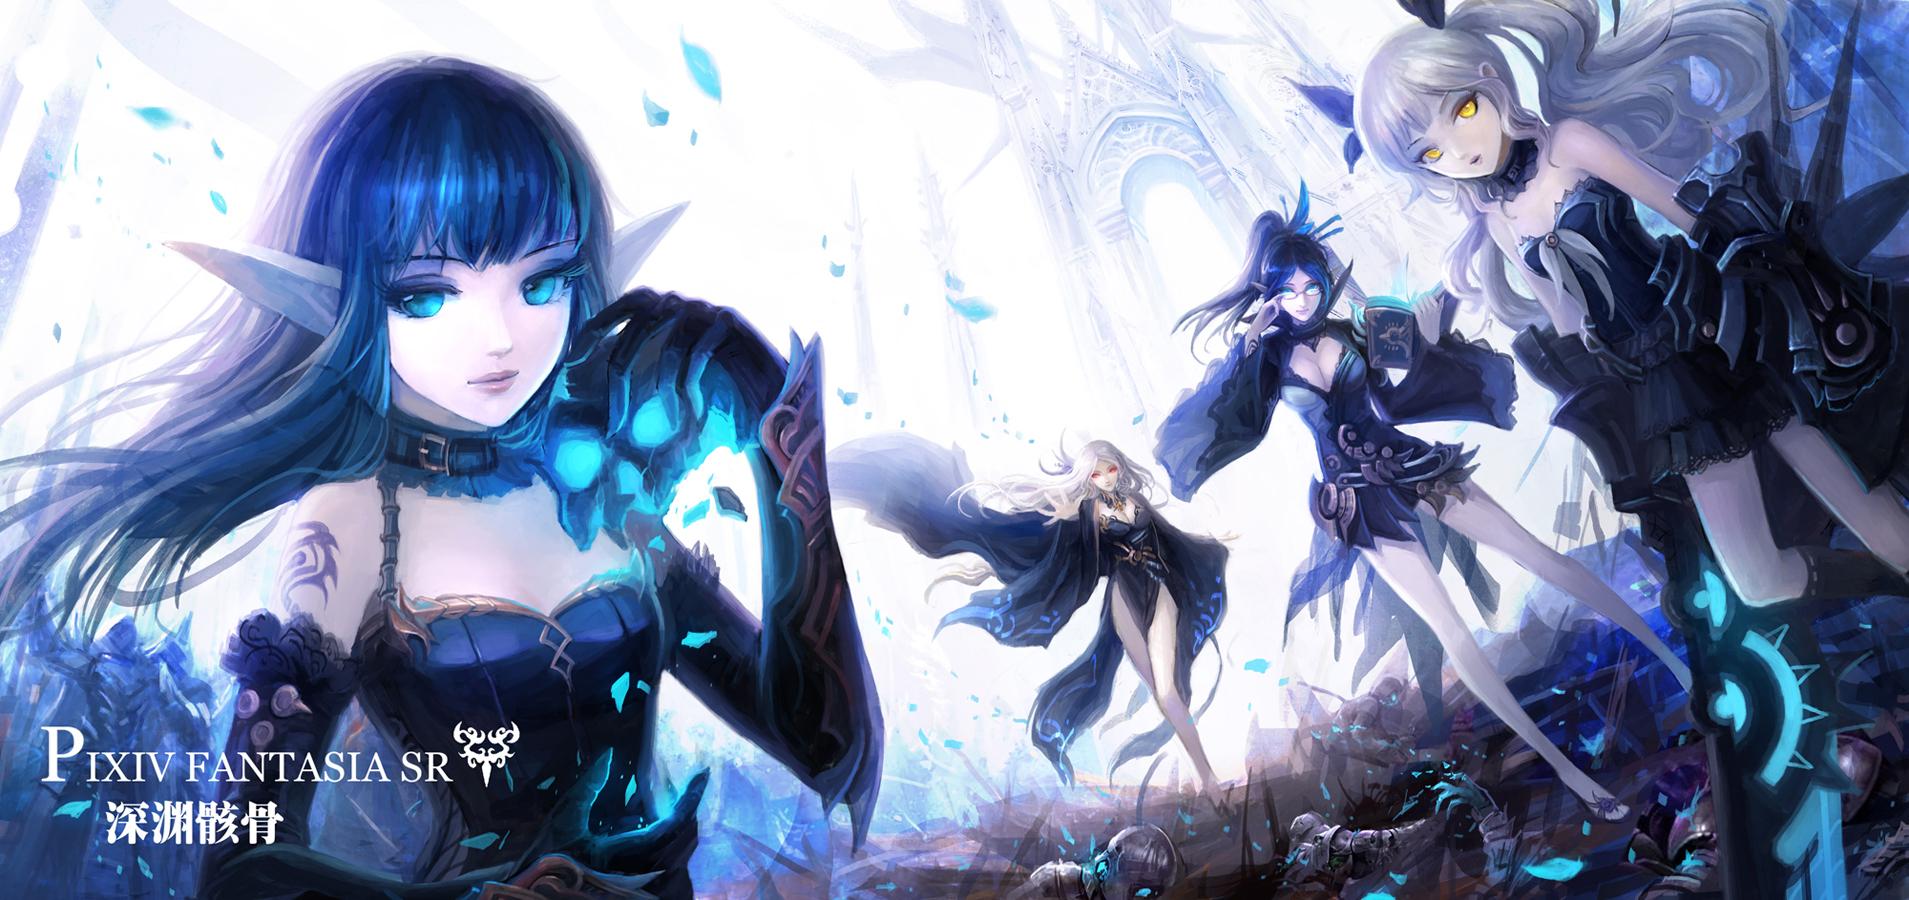 Anime Ninja Girl Wallpaper Hd Pixiv Fantasia Wallpaper And Background Image 1909x900